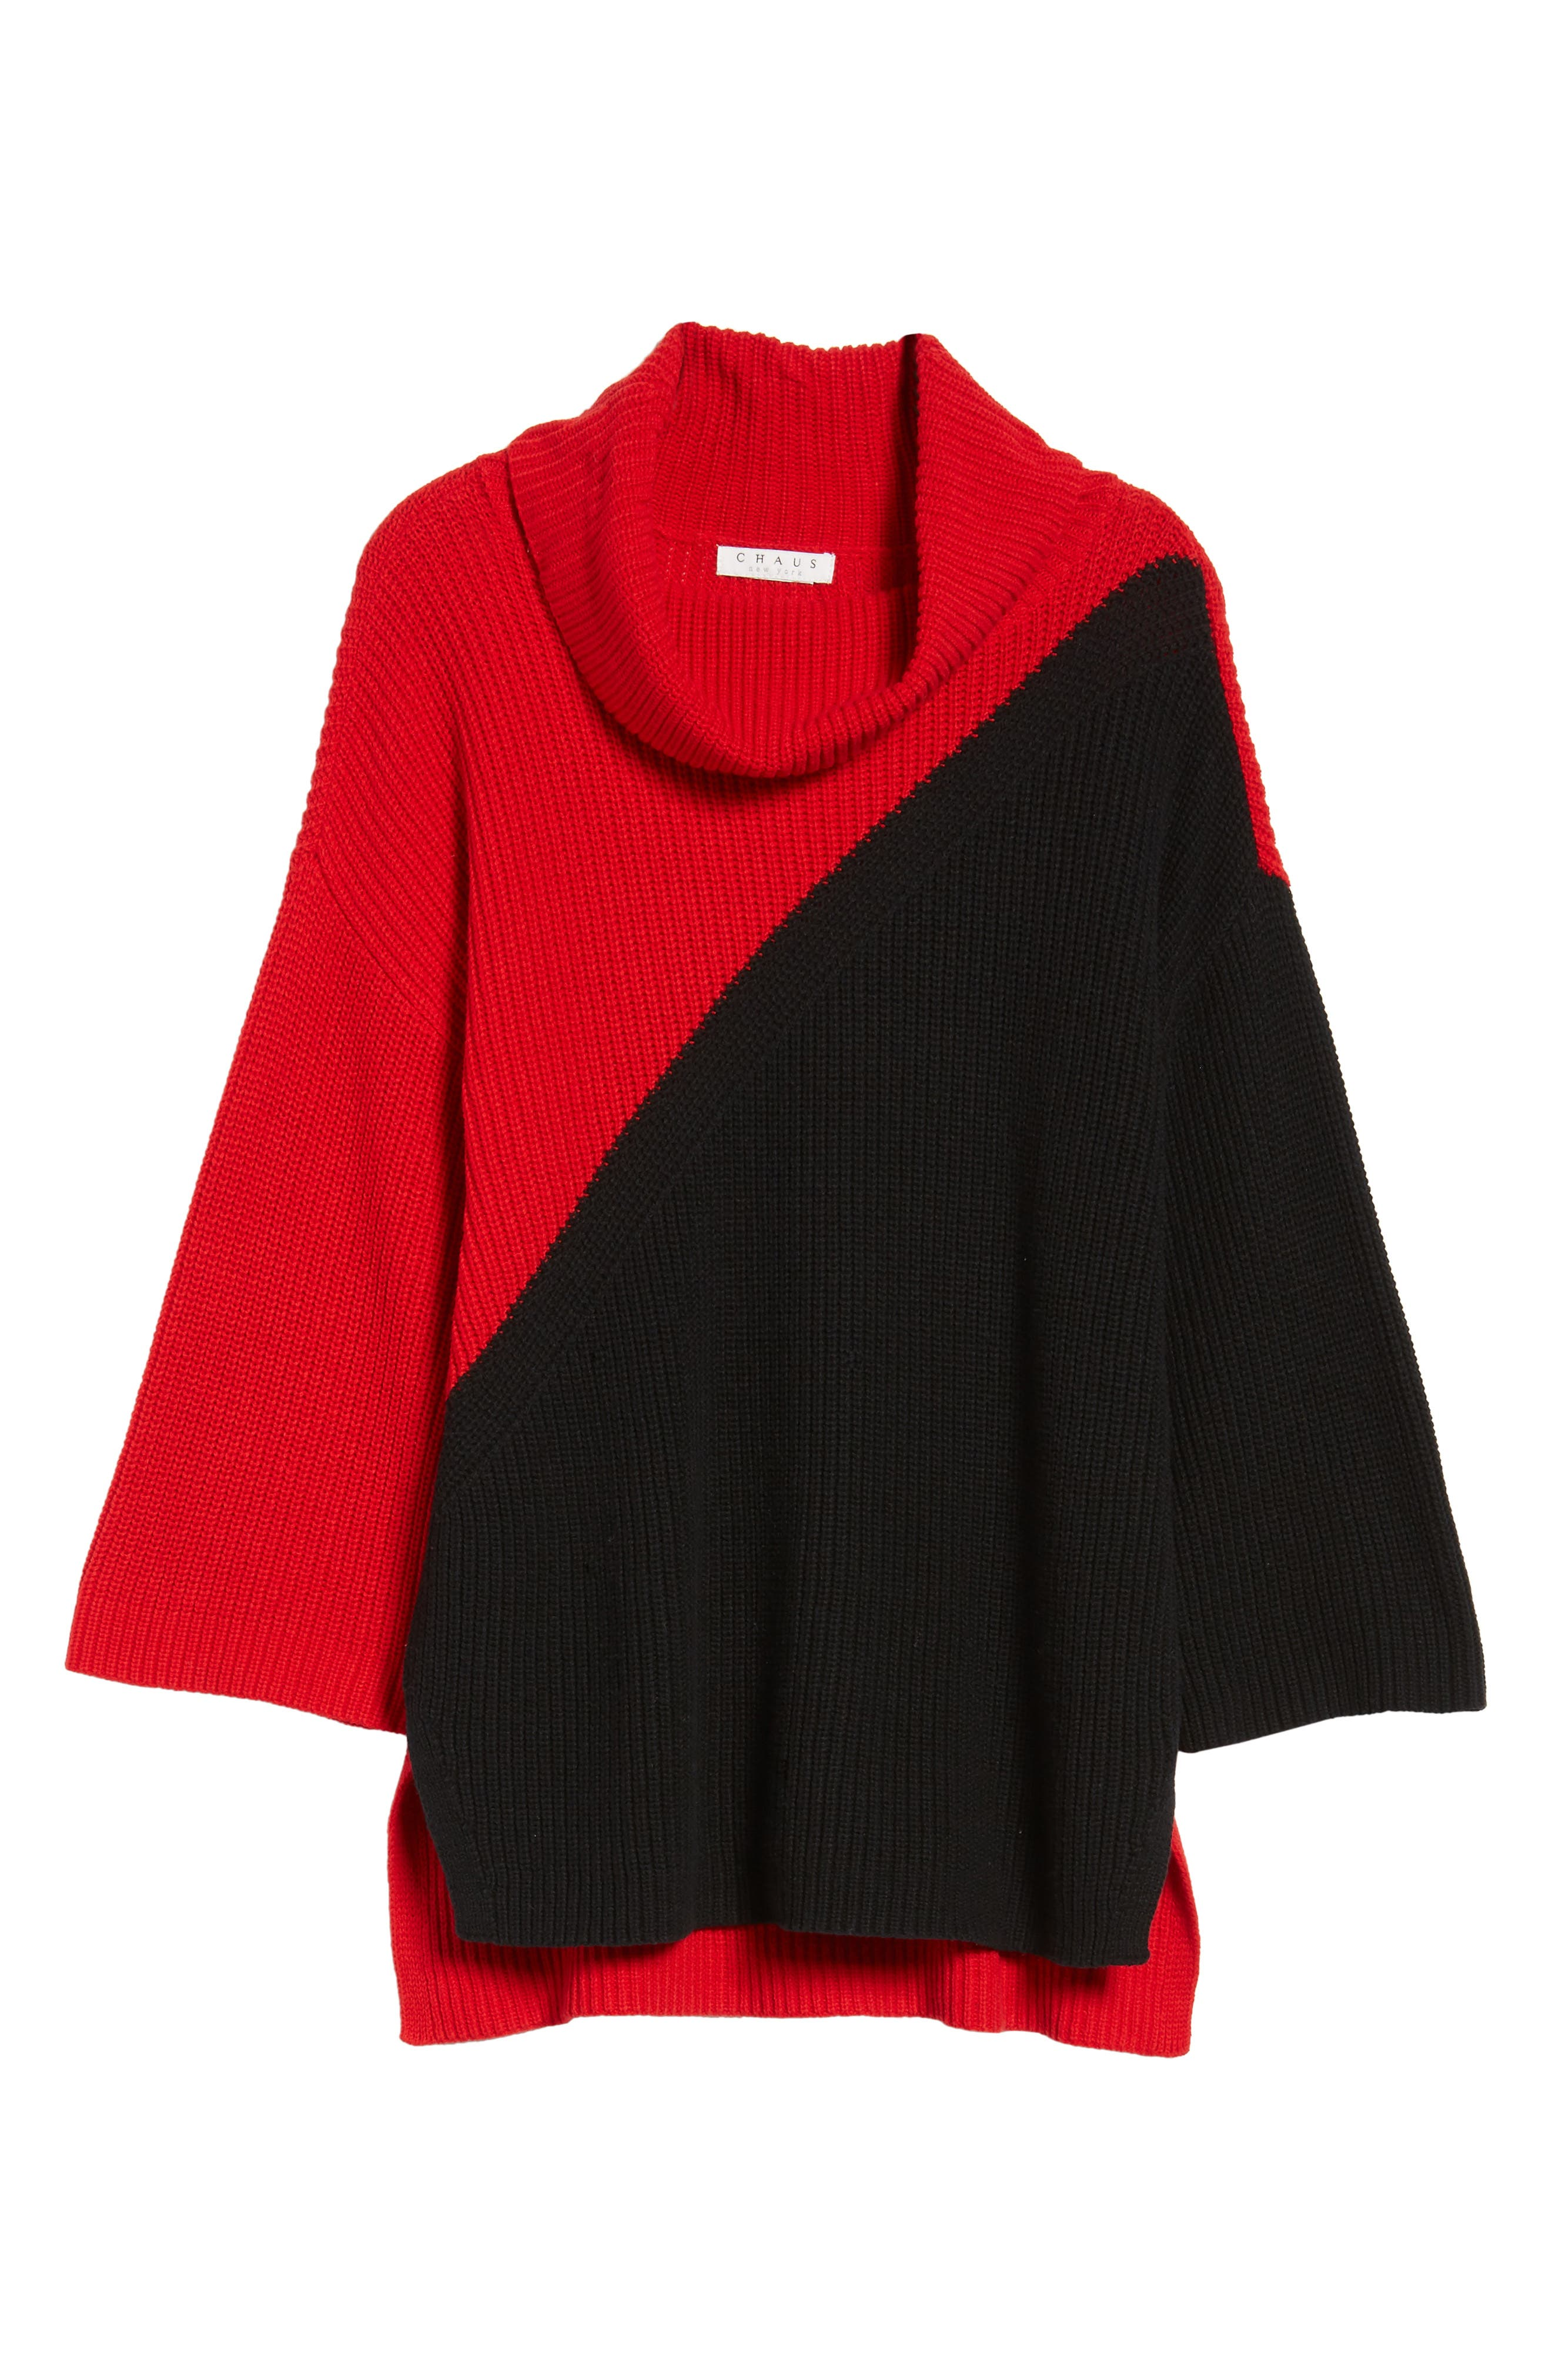 Colorblock Cowl Neck Sweater,                             Alternate thumbnail 6, color,                             Rouge